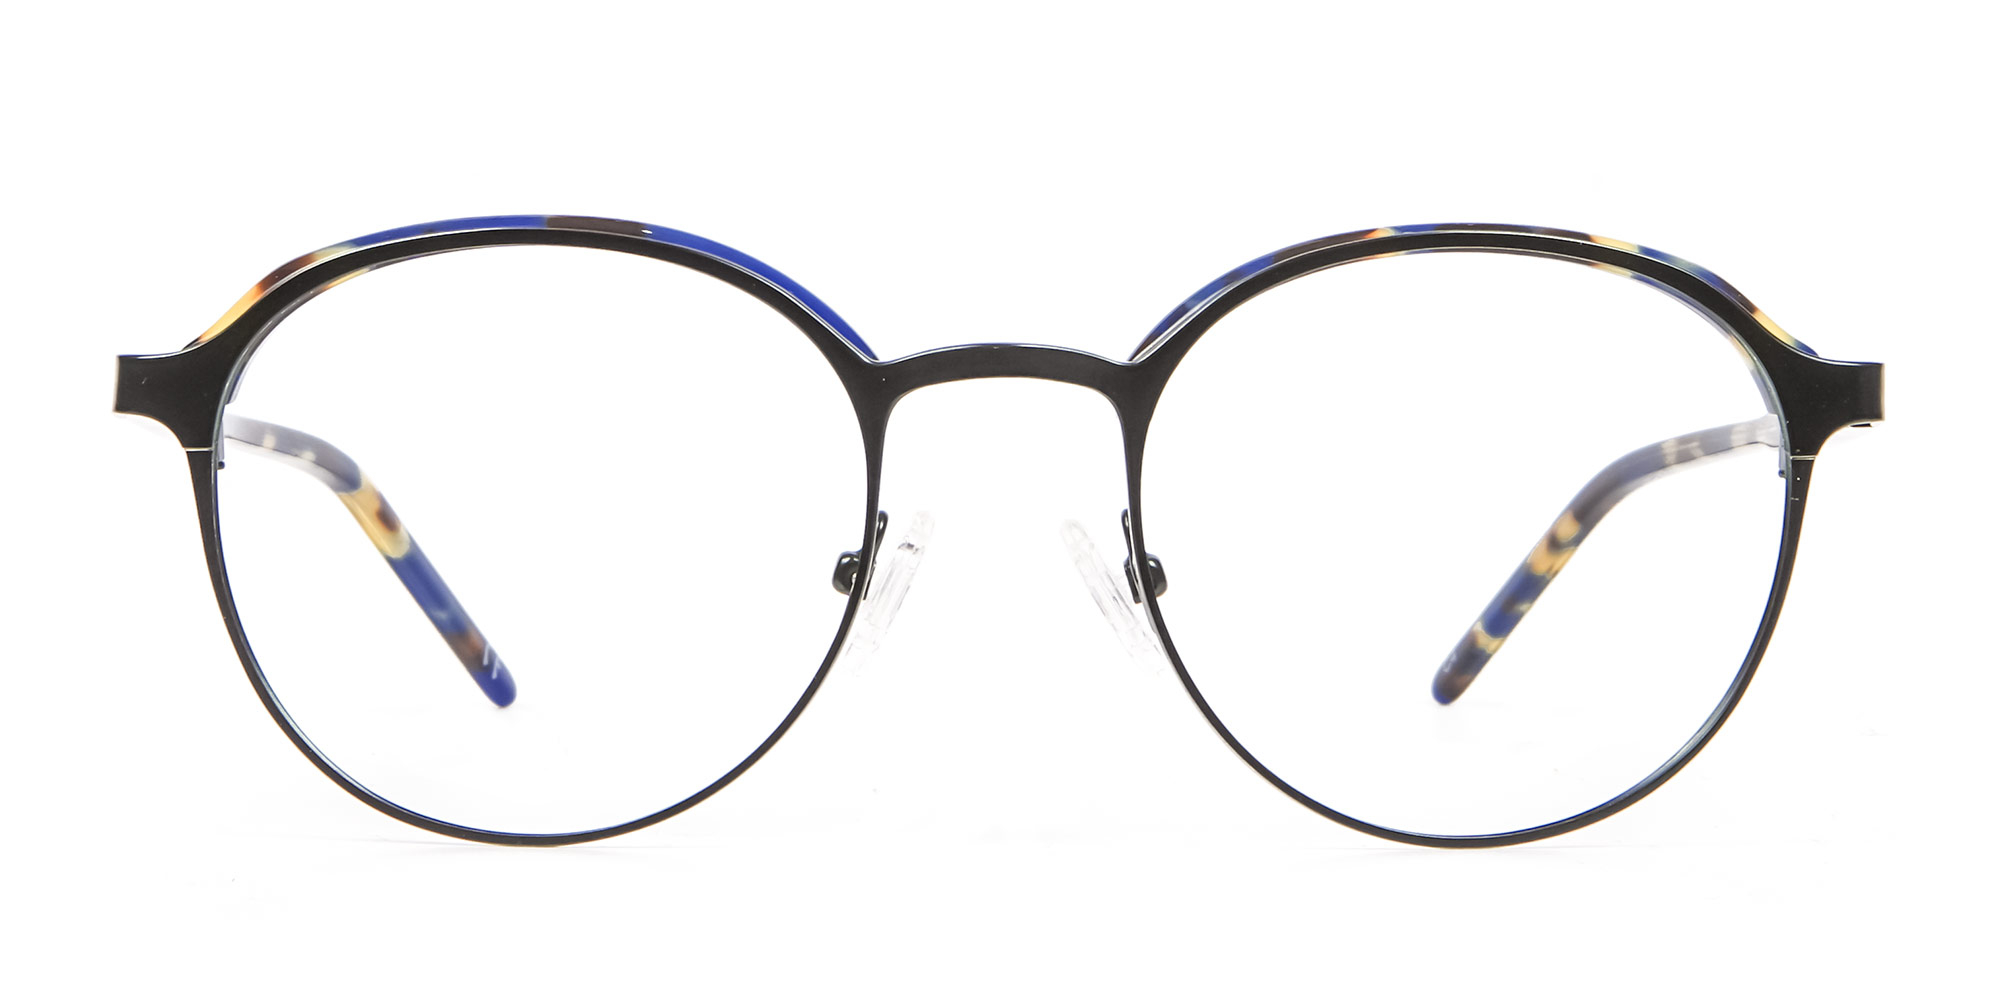 Green Tortoiseshell Glasses in Browline & Round